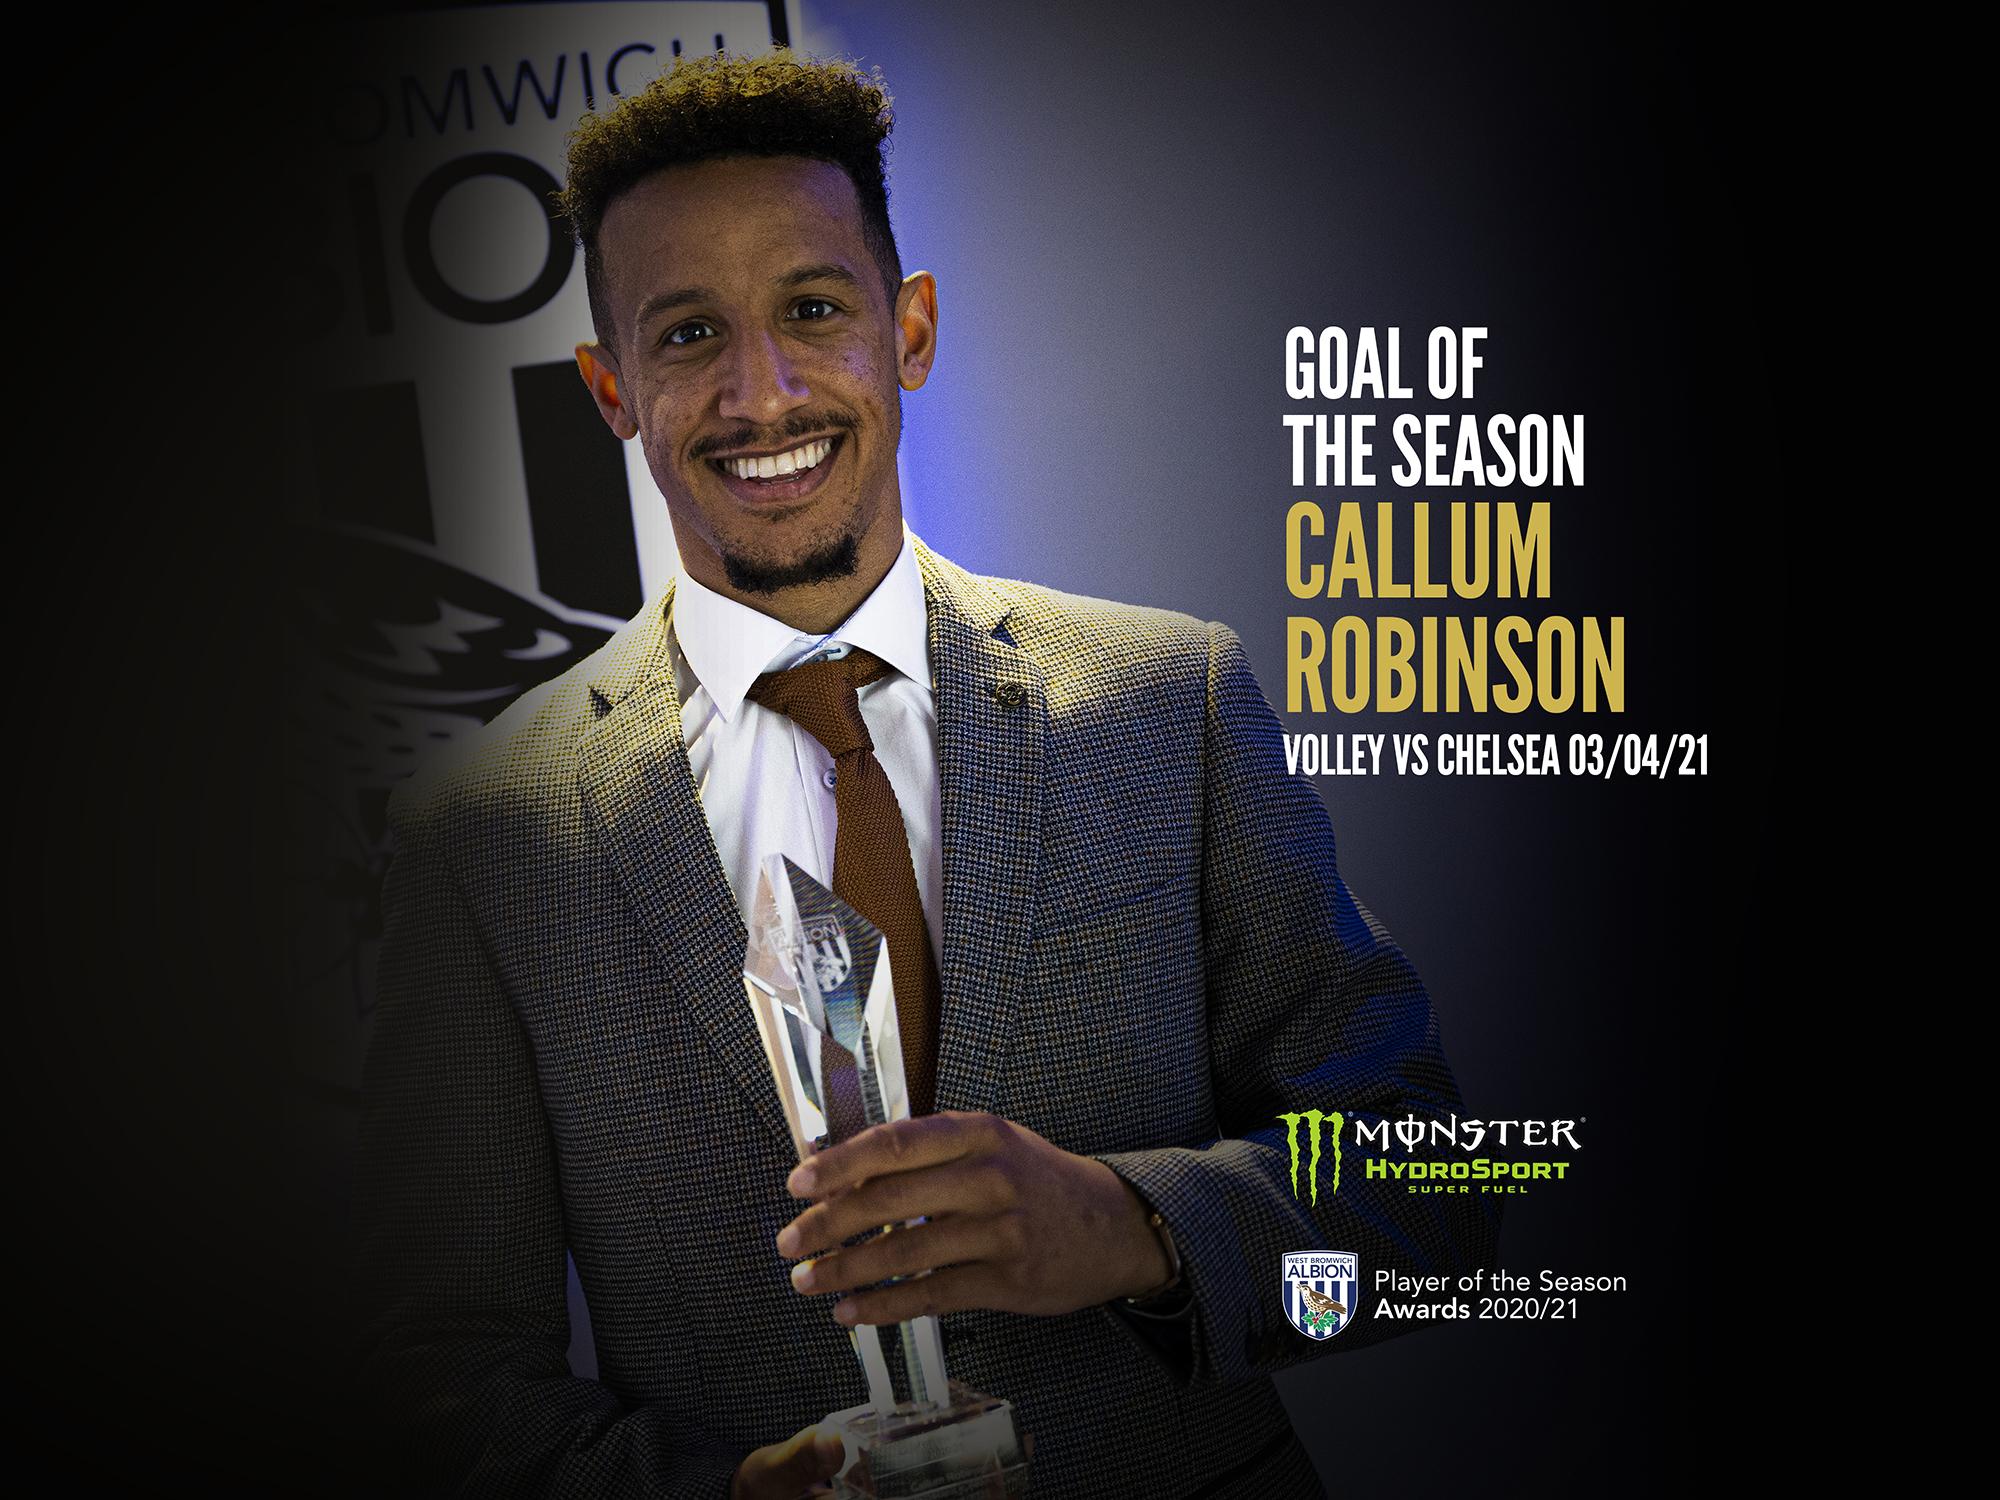 Robinson Goal of the Season